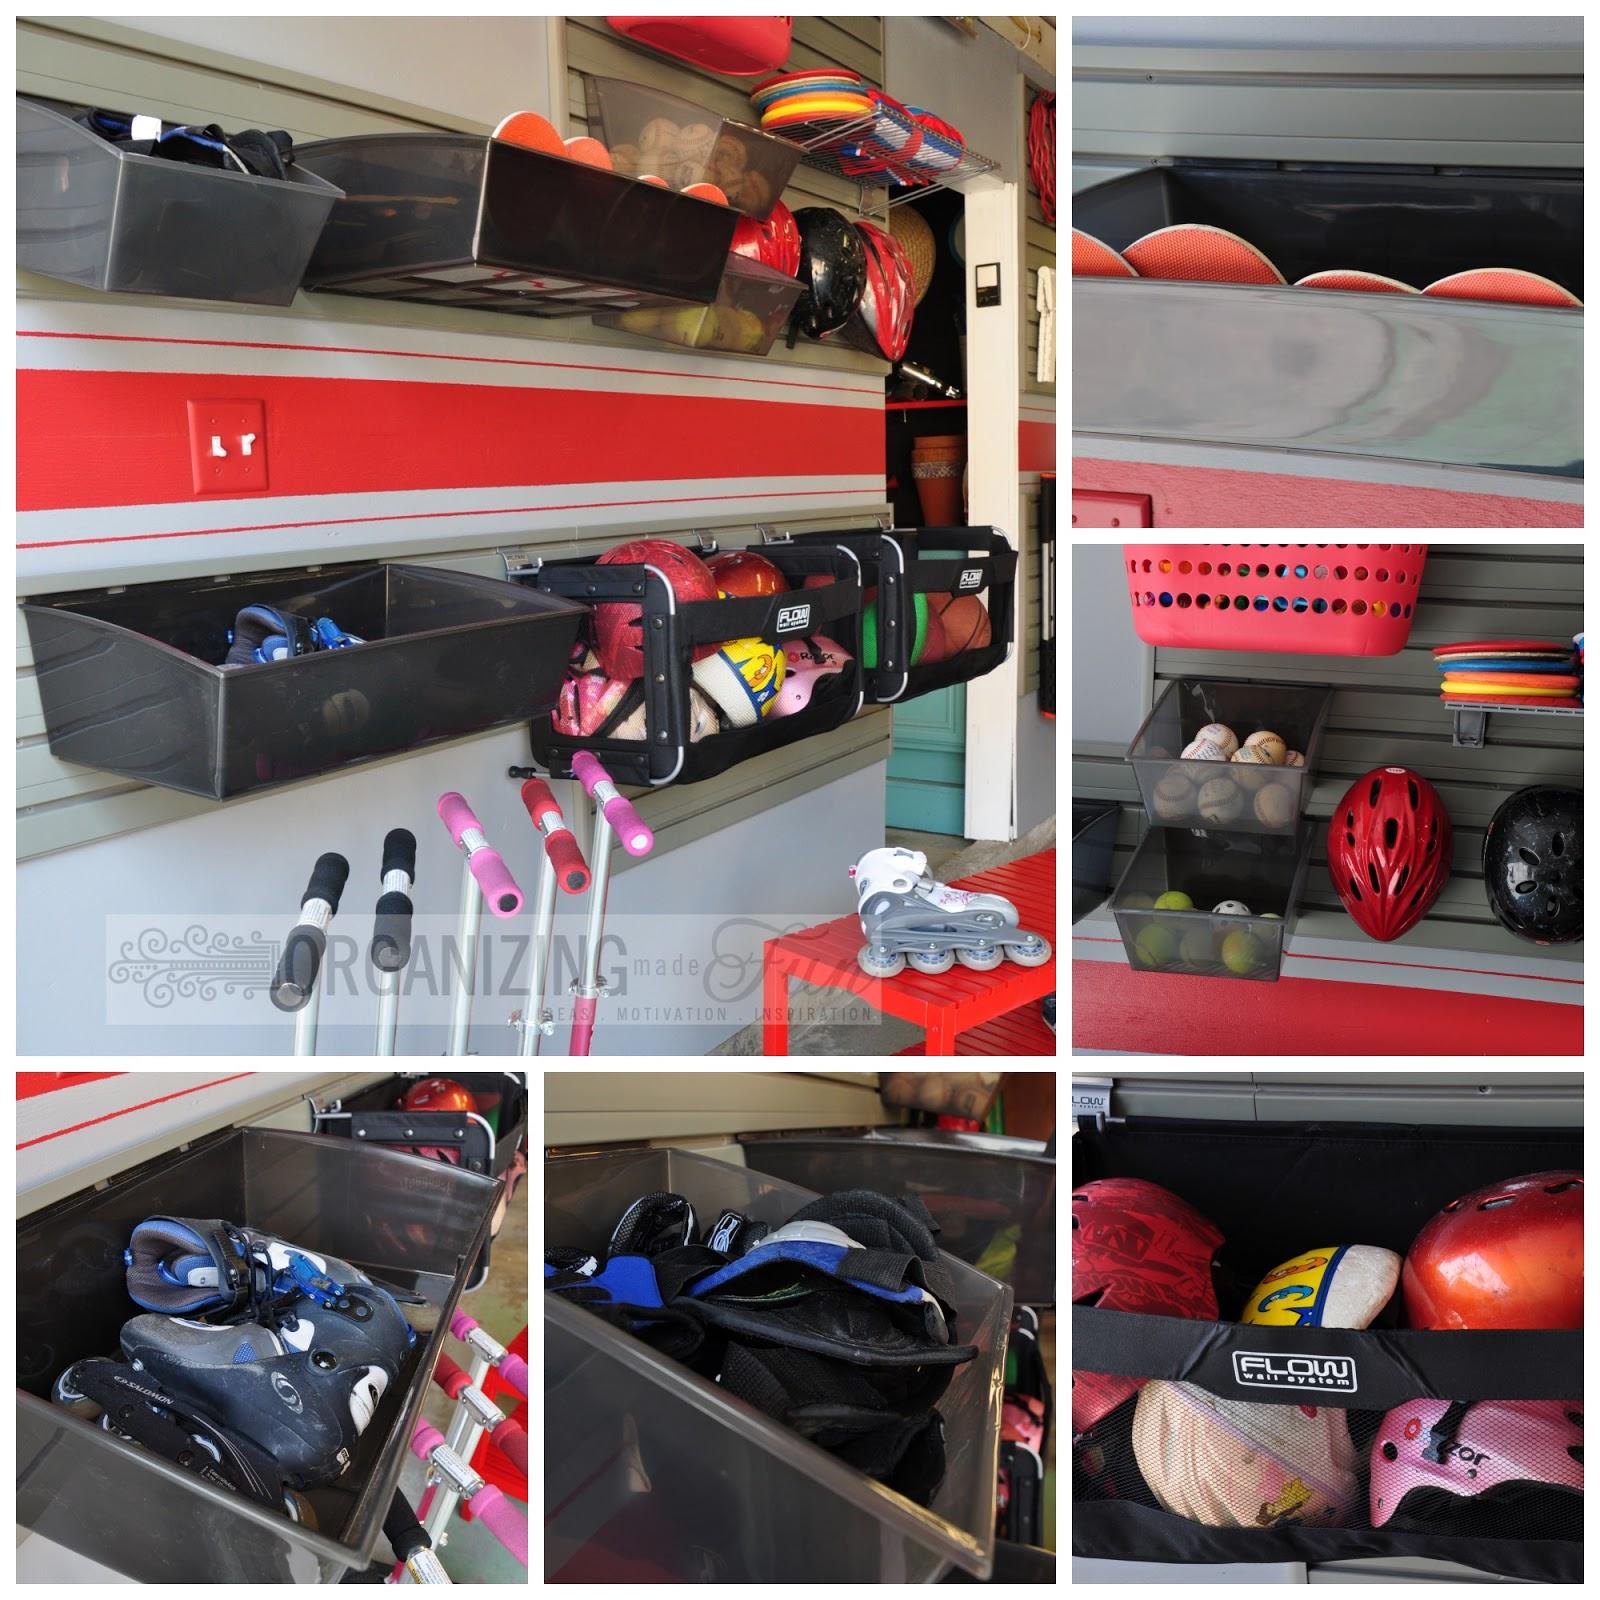 A Fun, Organized Garage